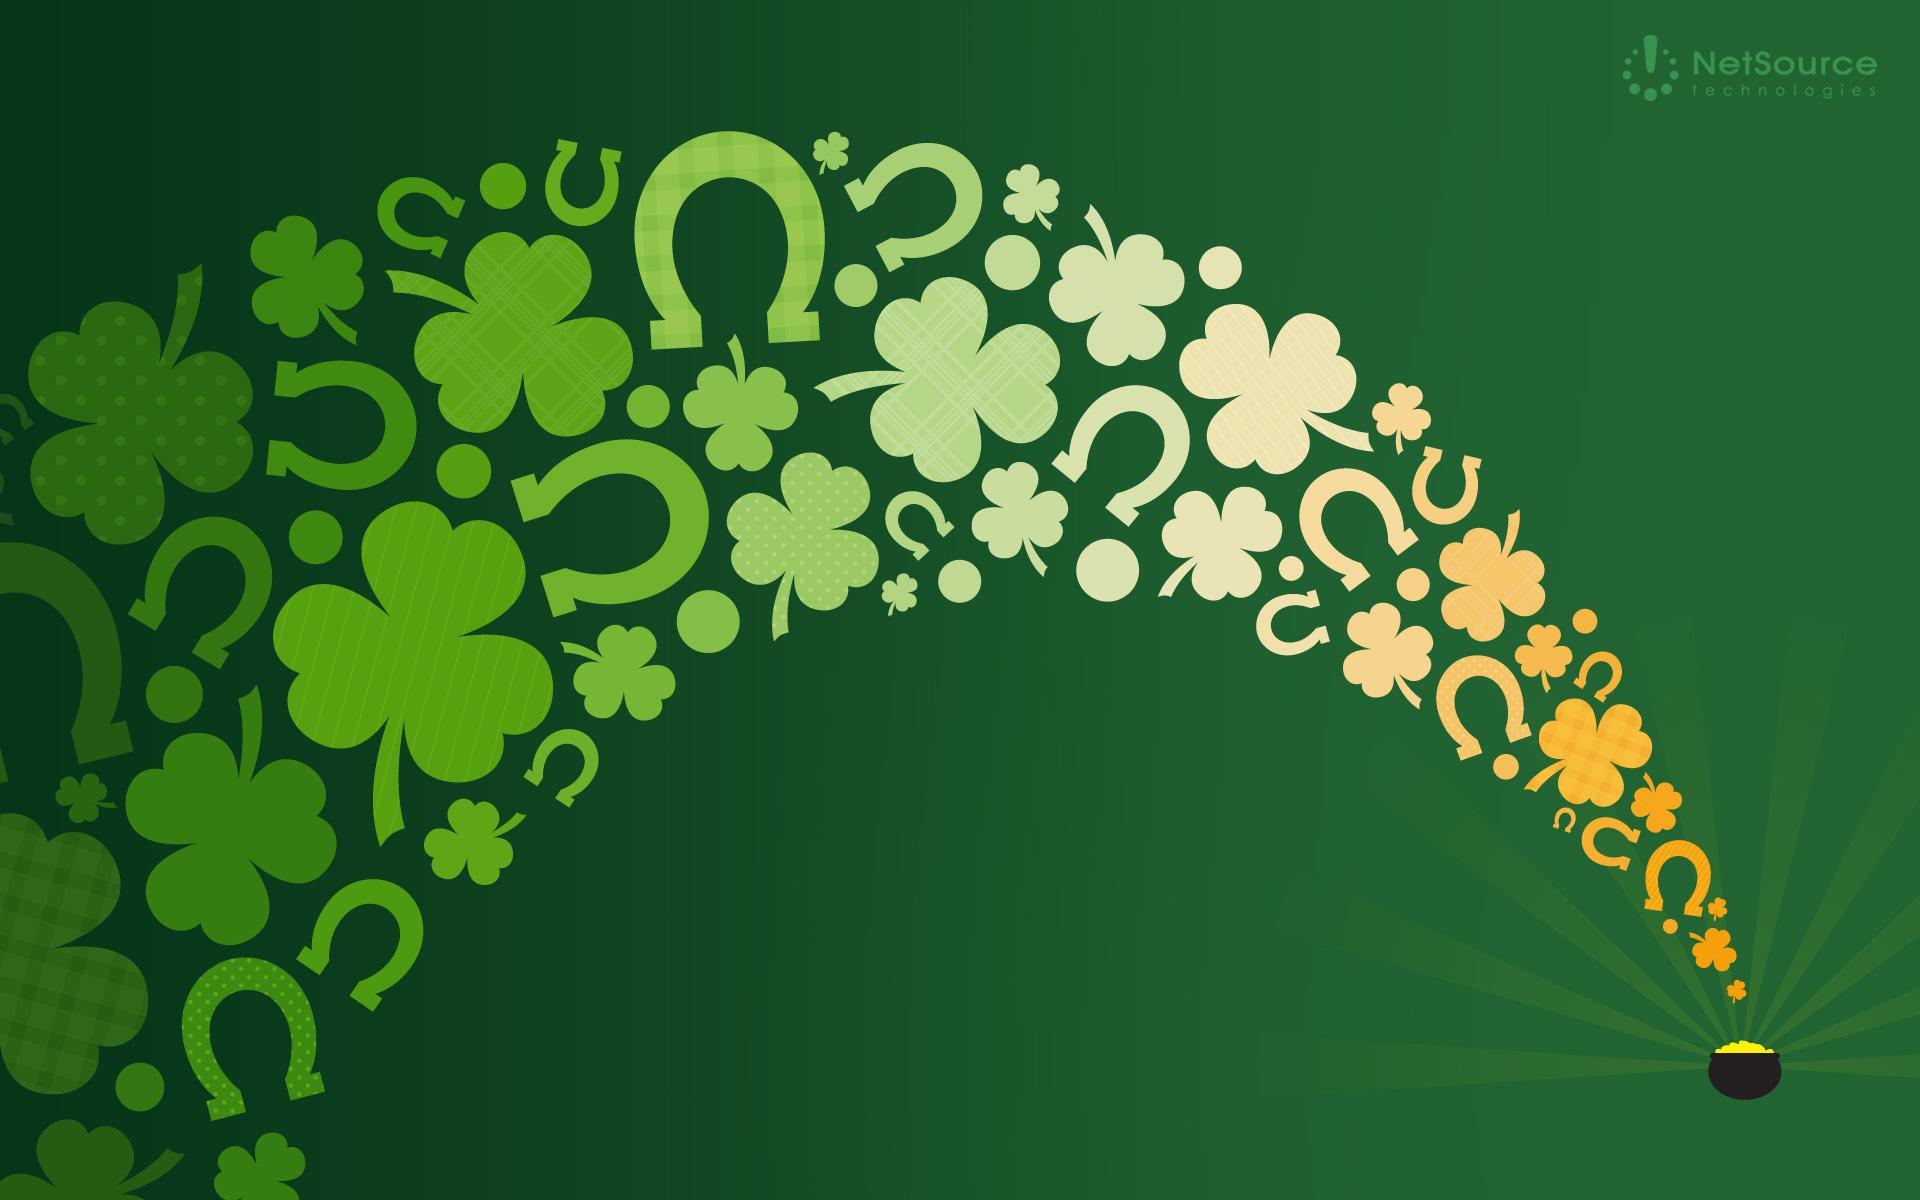 Saint Patricks Day wallpaper   396870 1920x1200